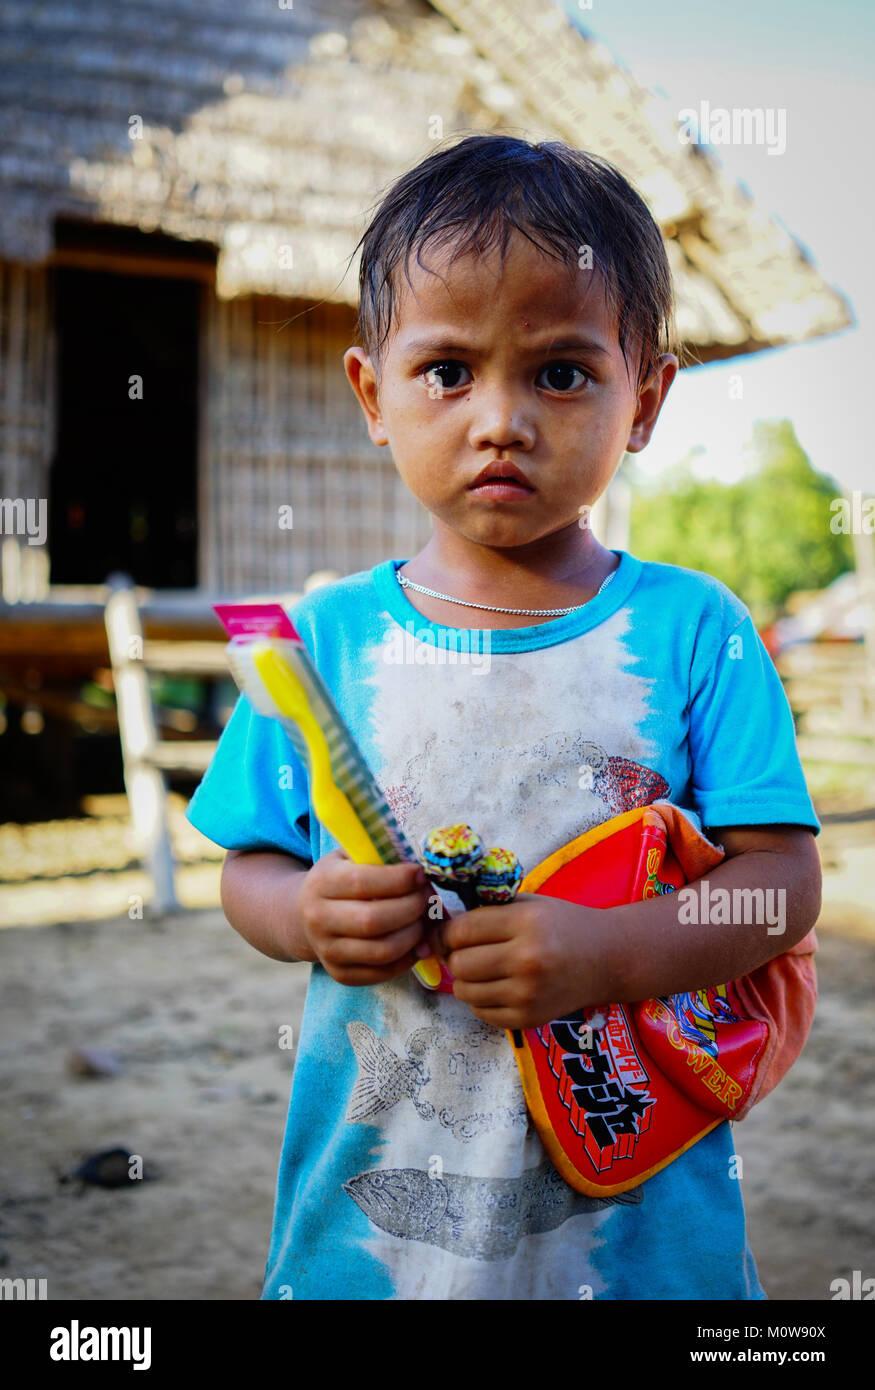 Daklak, Vietnam - Oct 10, 2015. Portrait of boy at small ethnic village in Daklak, Central Highlands of Vietnam. Stock Photo